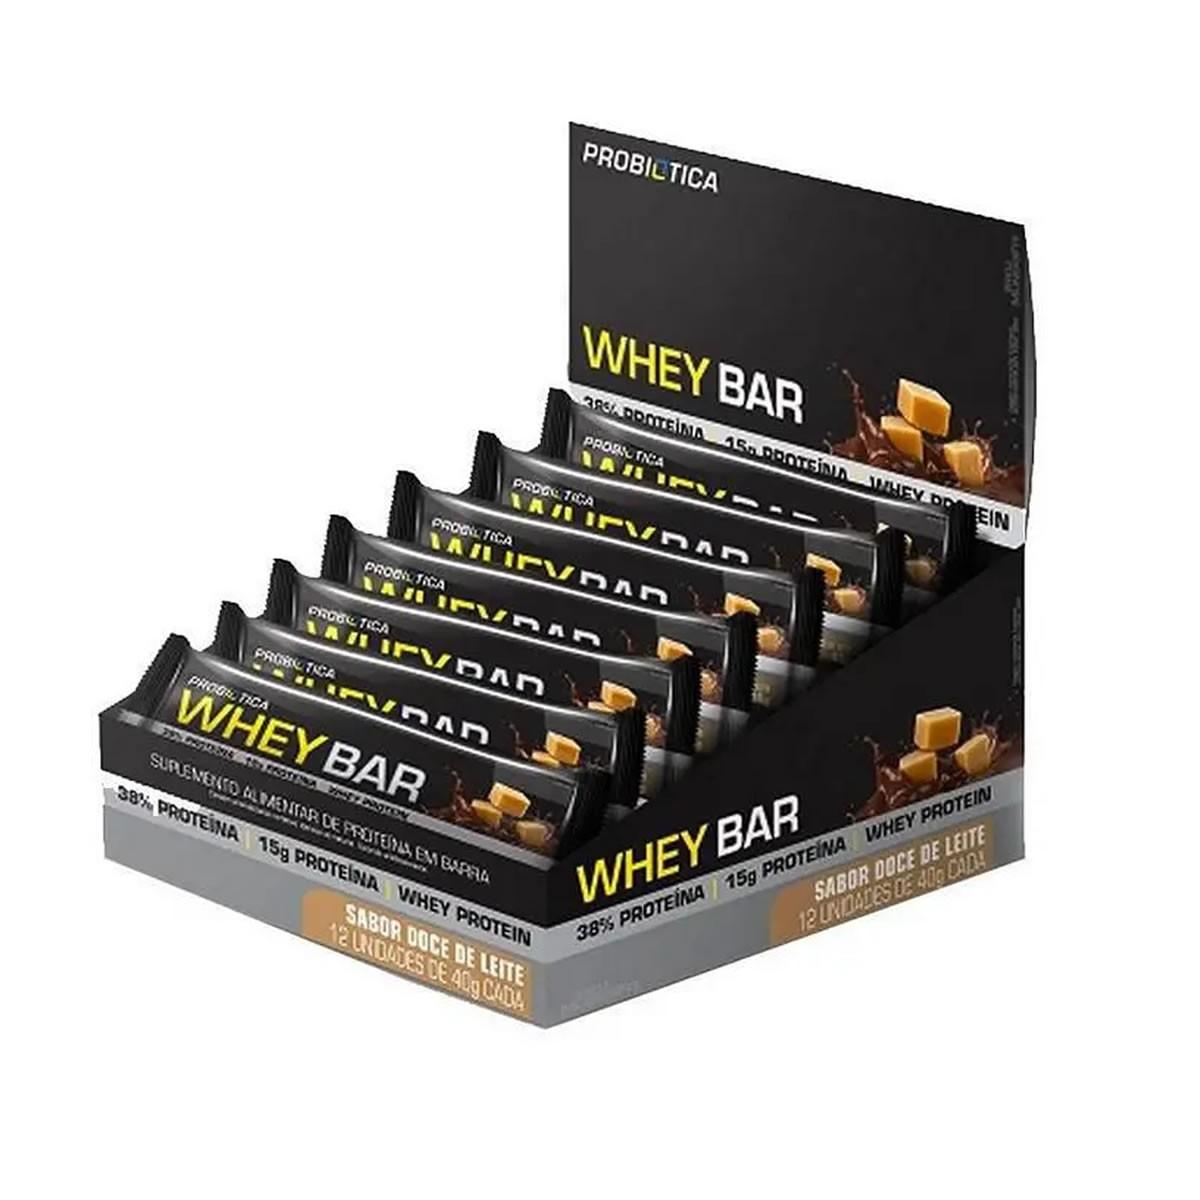 Barra de Proteína Whey Bar Sabor Doce de Leite Display com 12un de 40g - Probiotica